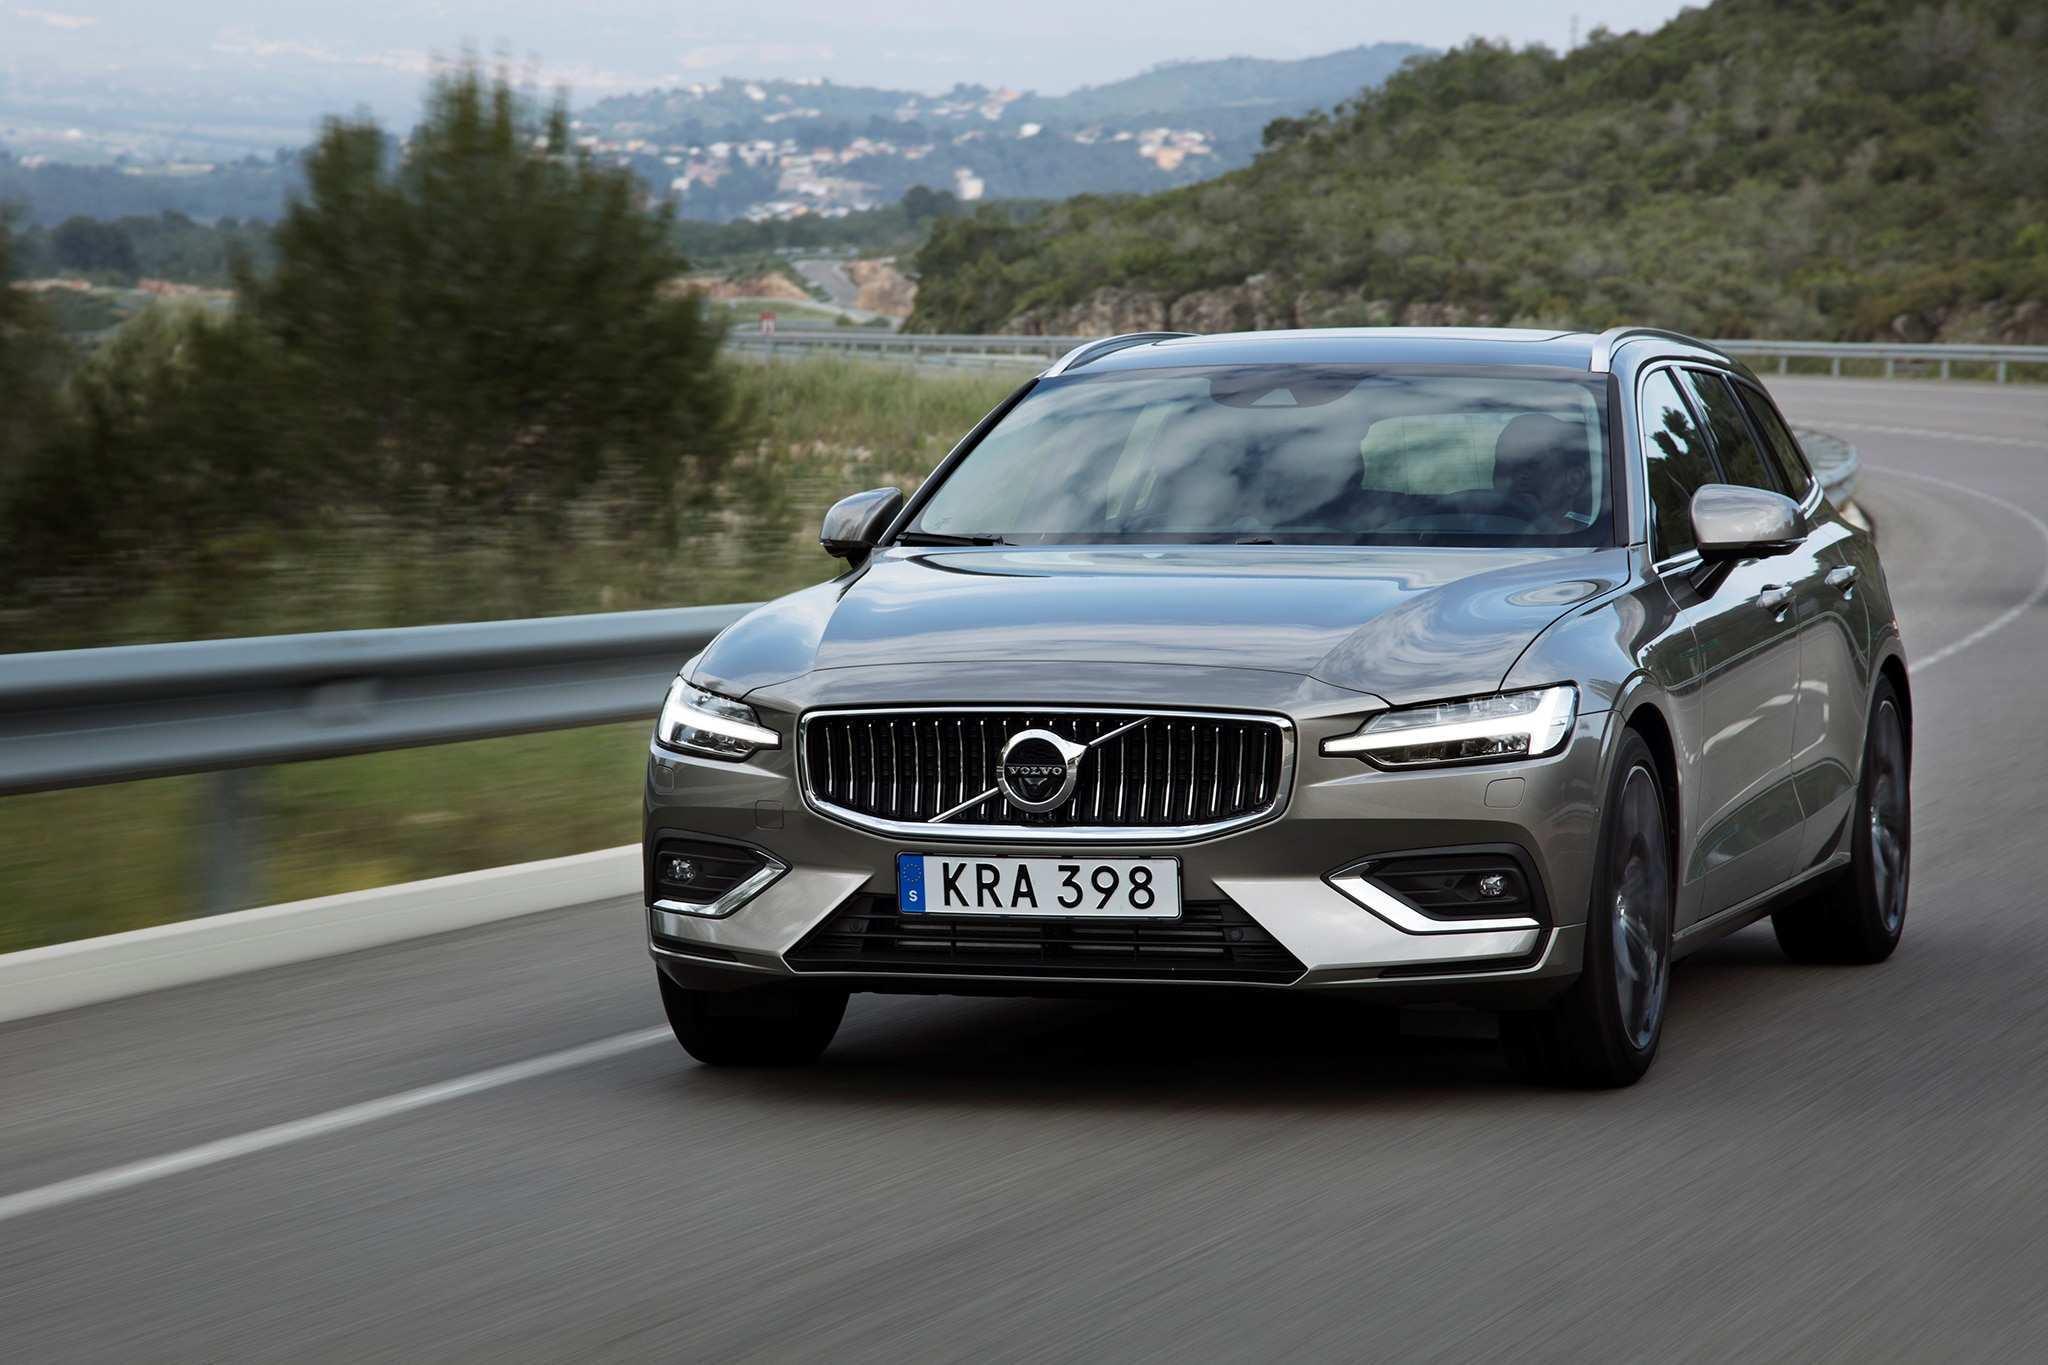 65 New 2019 Volvo Inscription Spesification for 2019 Volvo Inscription